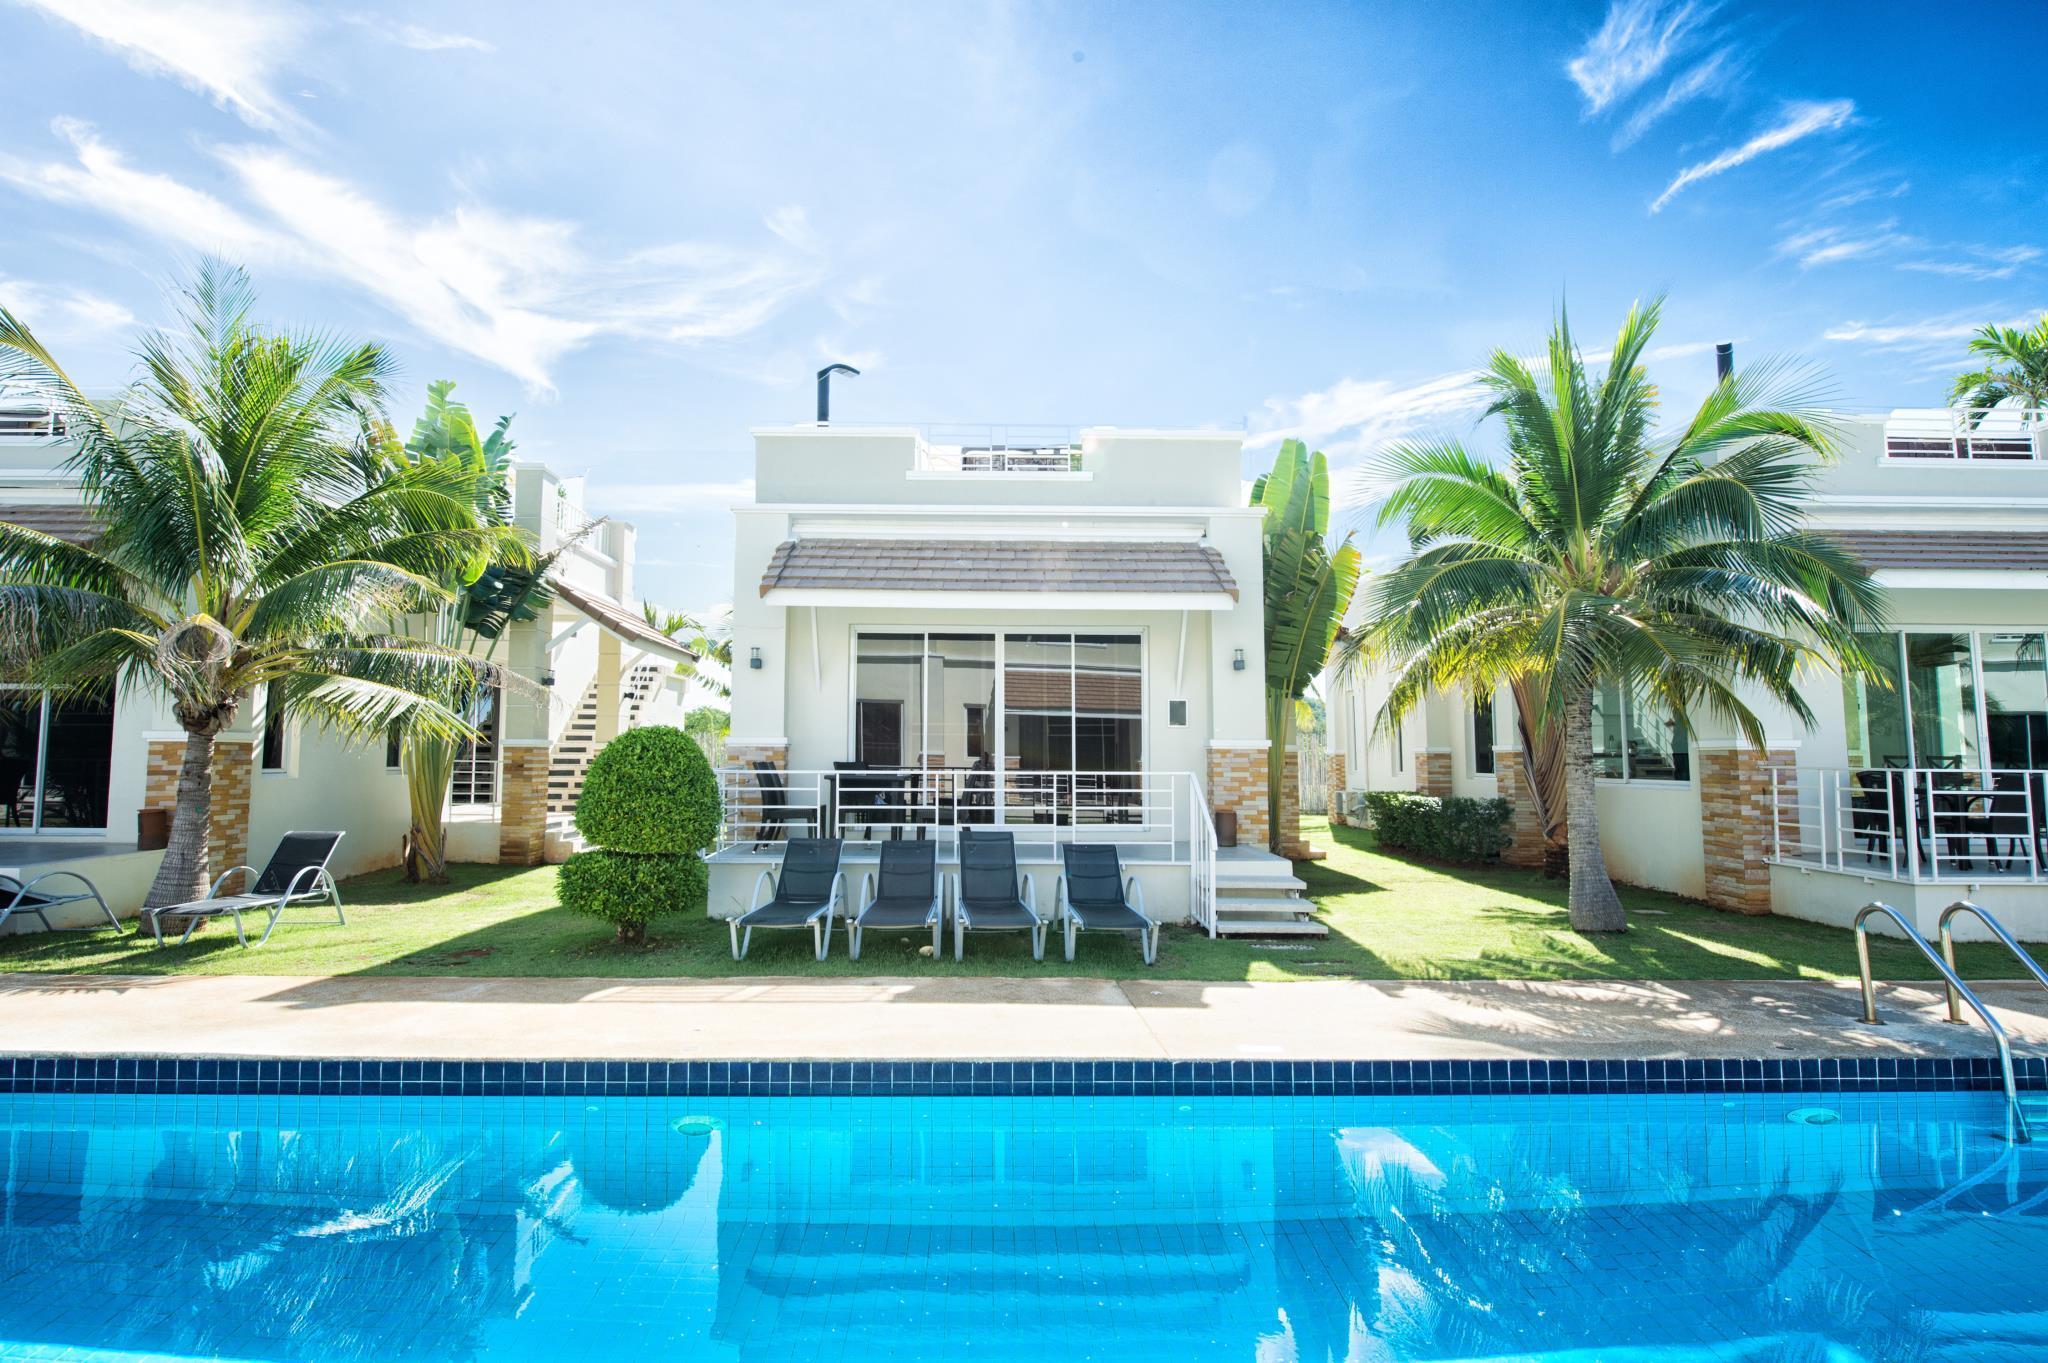 Best Price on Oriental Beach Pearl Resort in Hua Hin / Cha-am + Reviews!